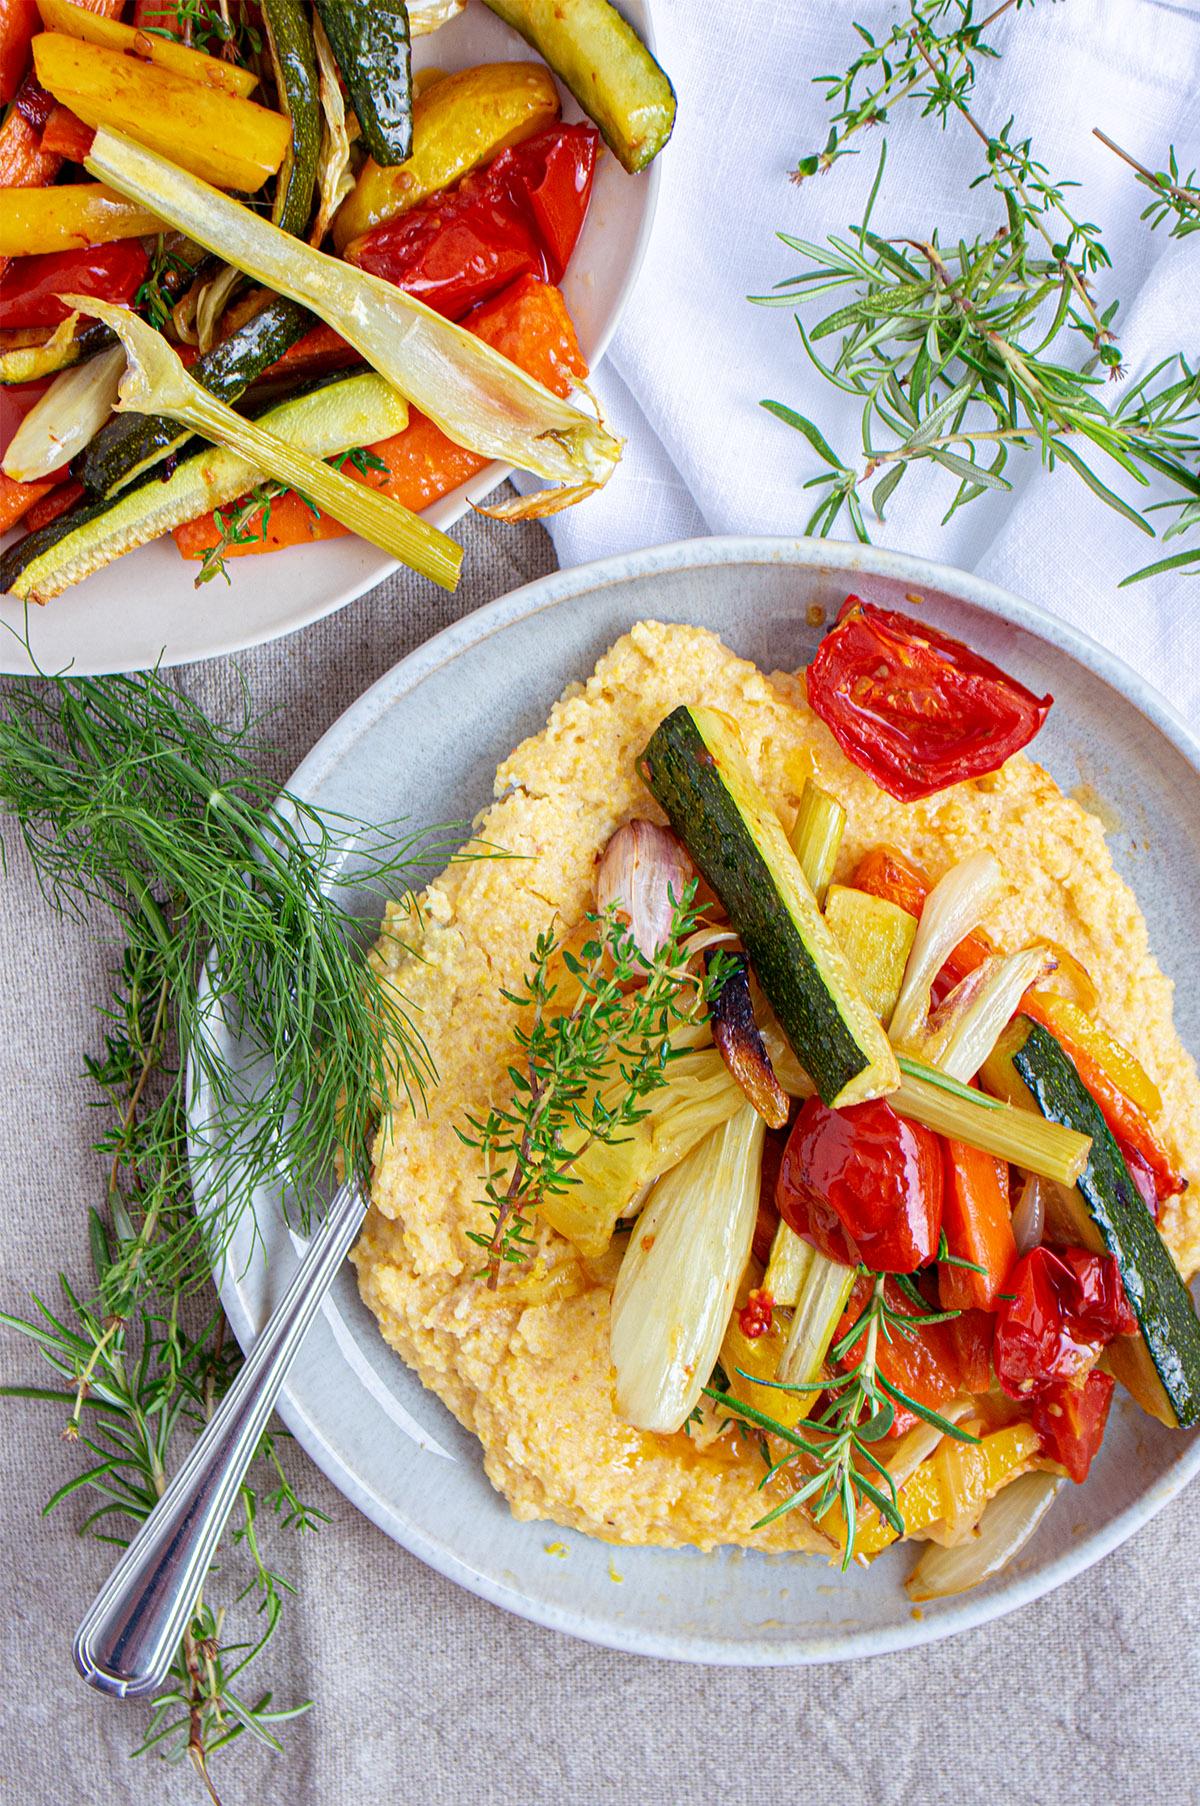 cremige polenta mit ofengemüse, vegane polenta, Creamy Lemon Polenta with Oven-Grilled Veggies